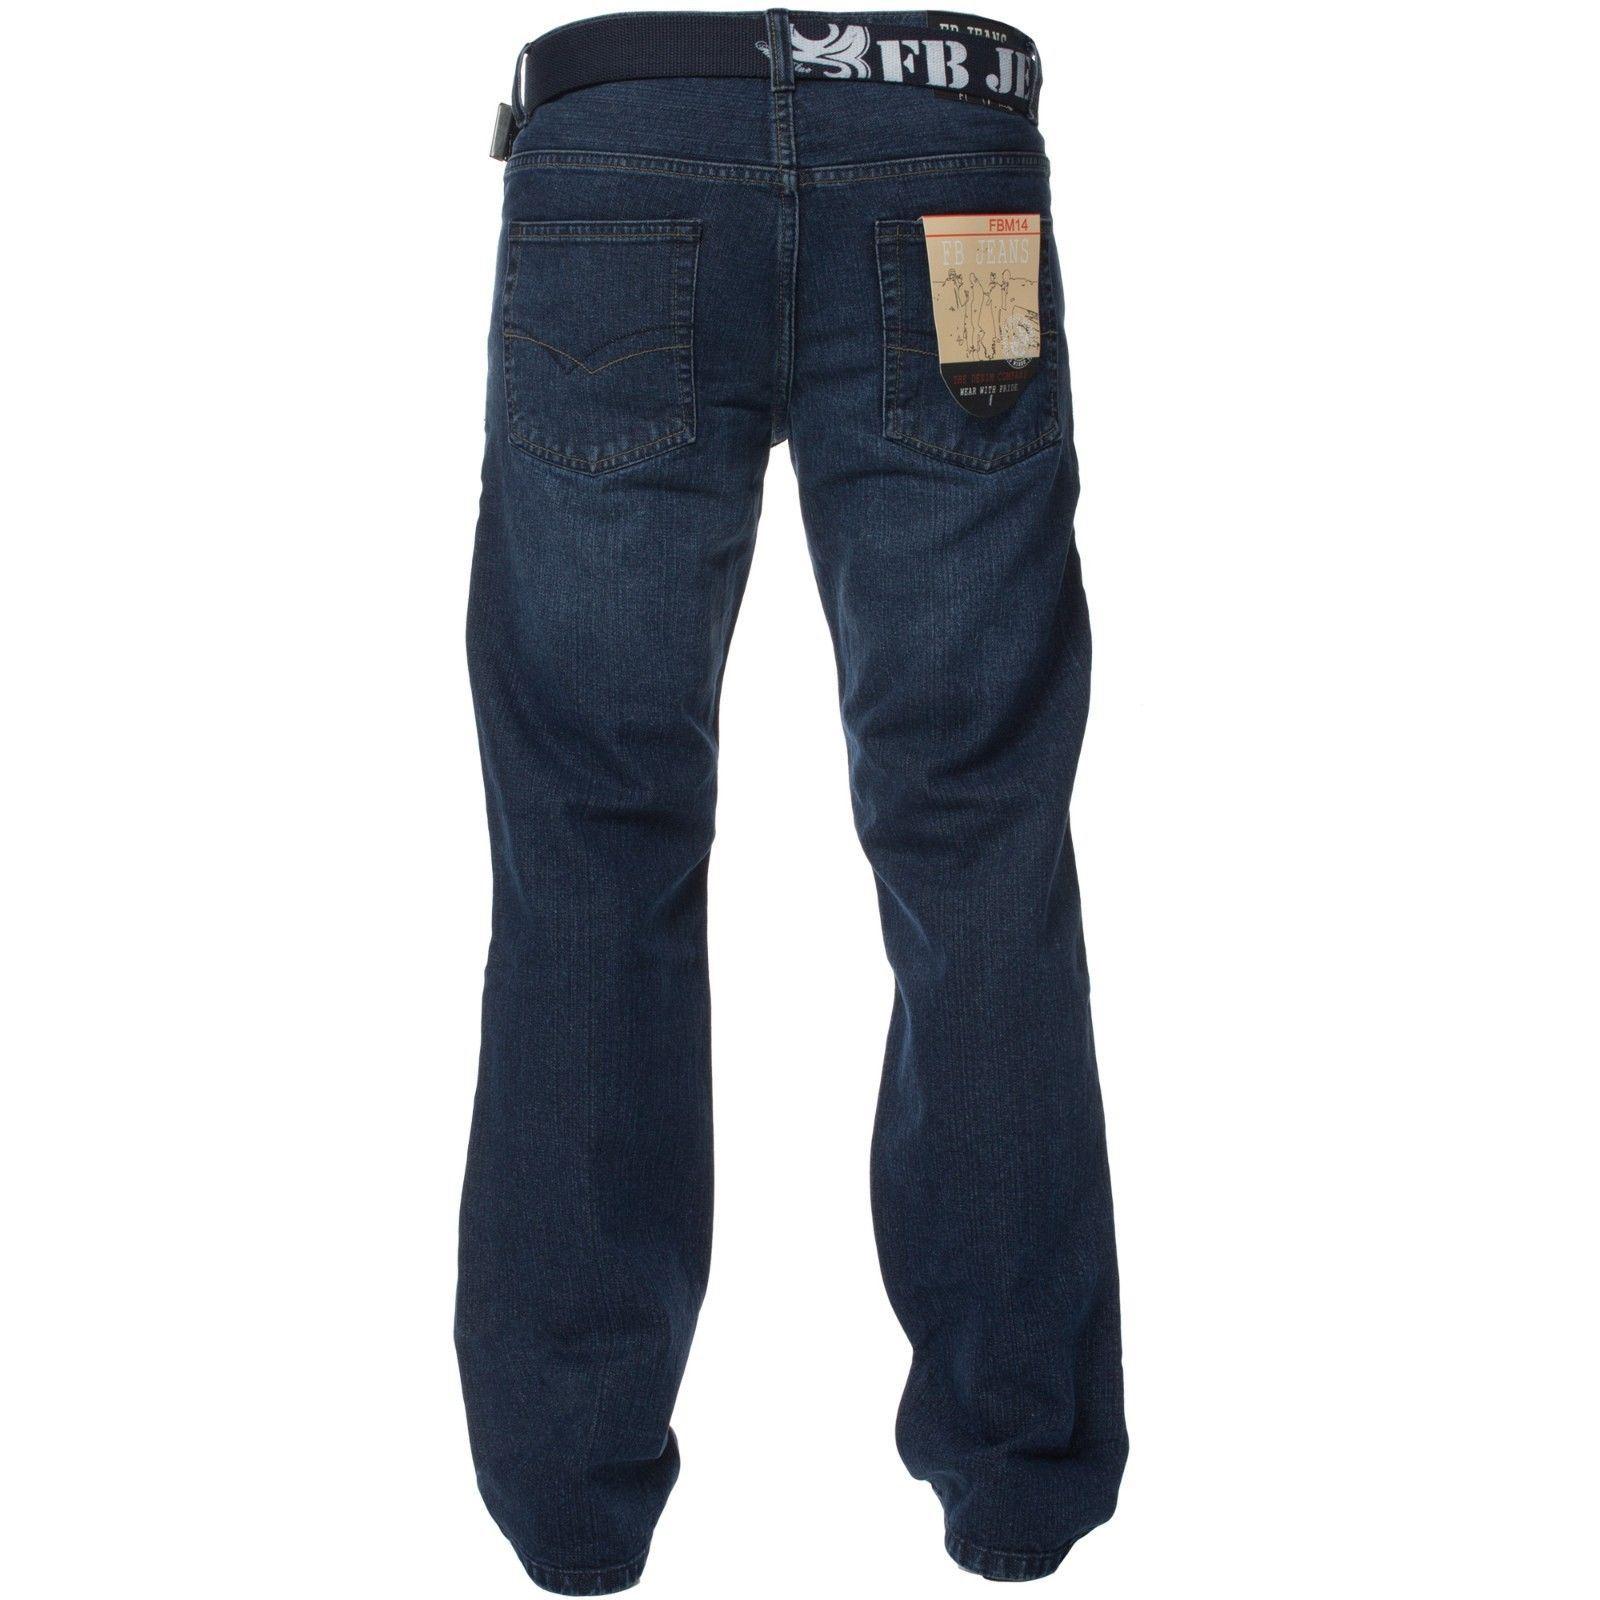 Mens-Straight-Leg-Jeans-Regular-Fit-Denim-Pants-Cotton-Free-Belt-All-Waist-Sizes thumbnail 5